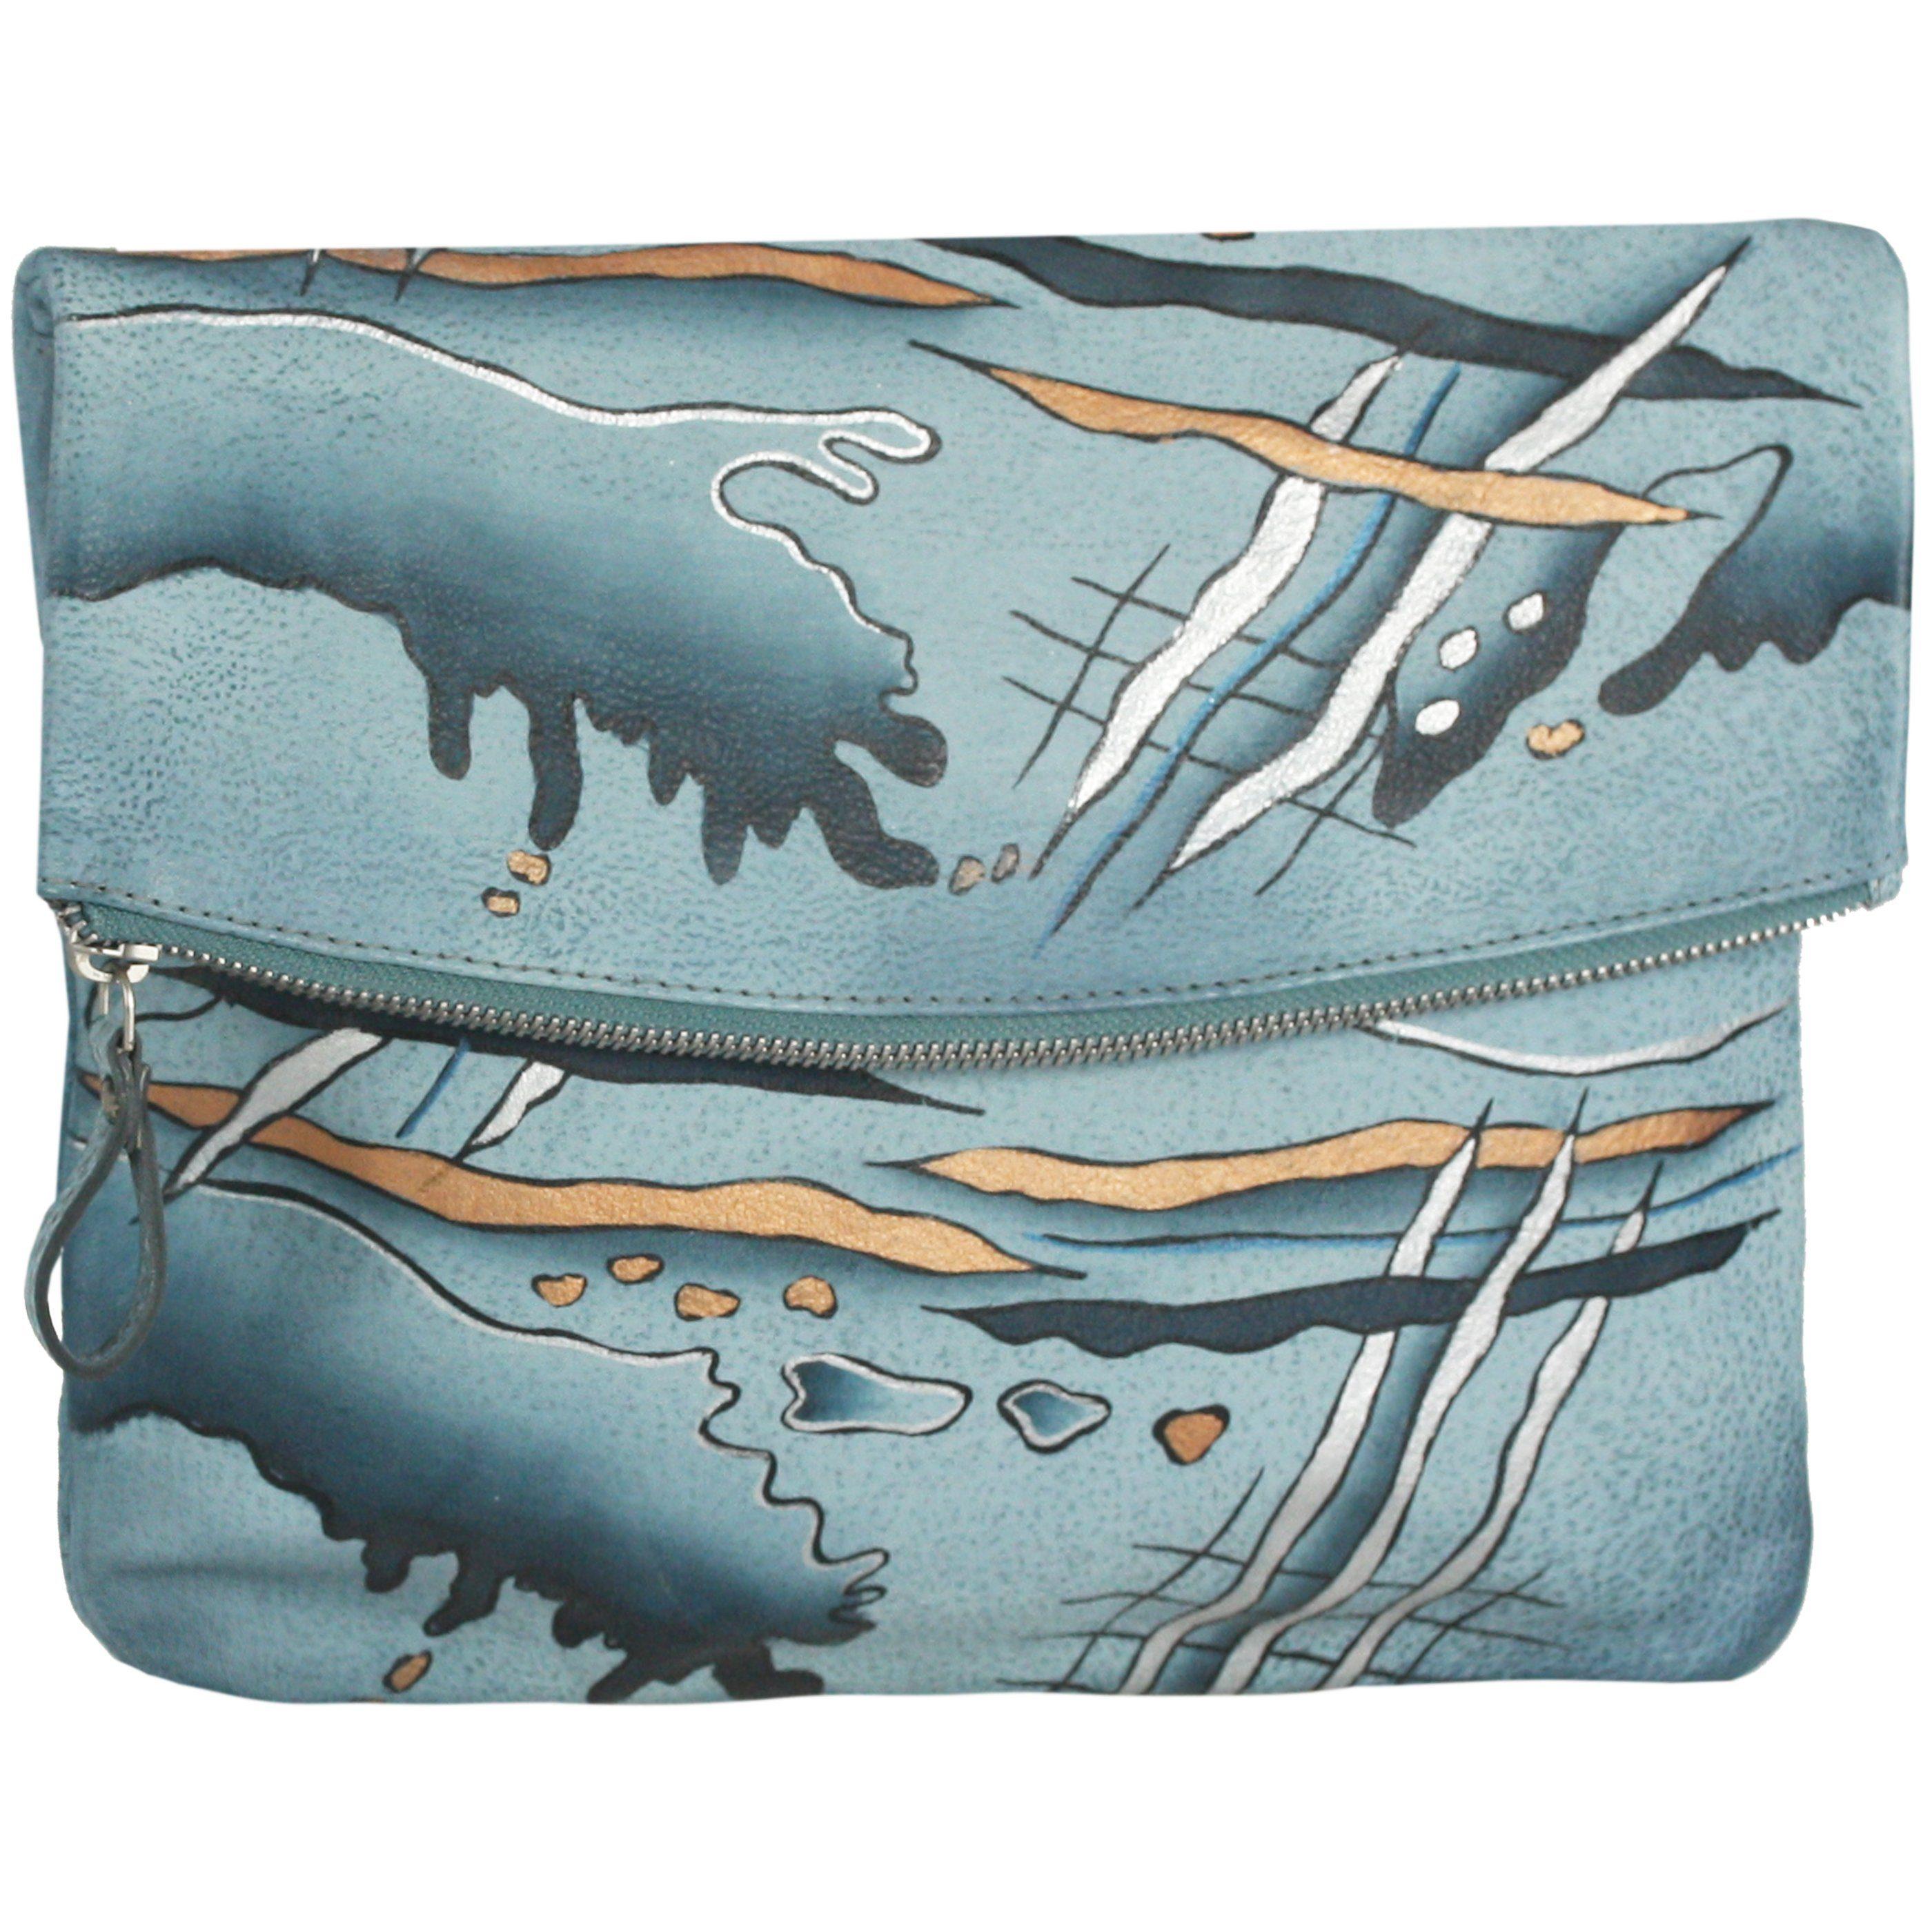 GREENLAND Art + Craft Flap Bag Umhängetasche Leder 29 cm